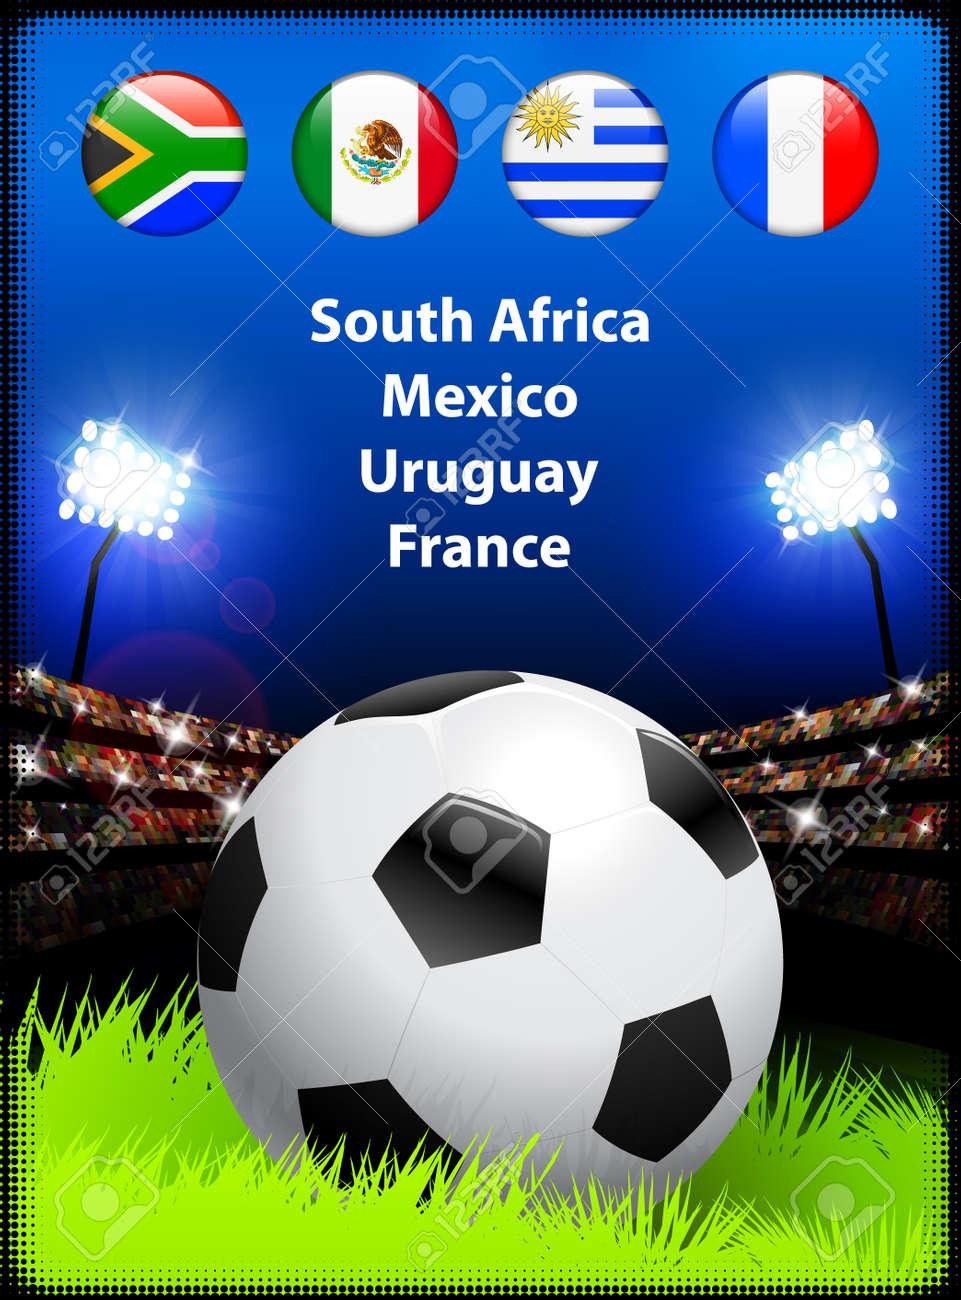 World Soccer Compeition Group AOriginal Illustration Stock Vector - 22423270